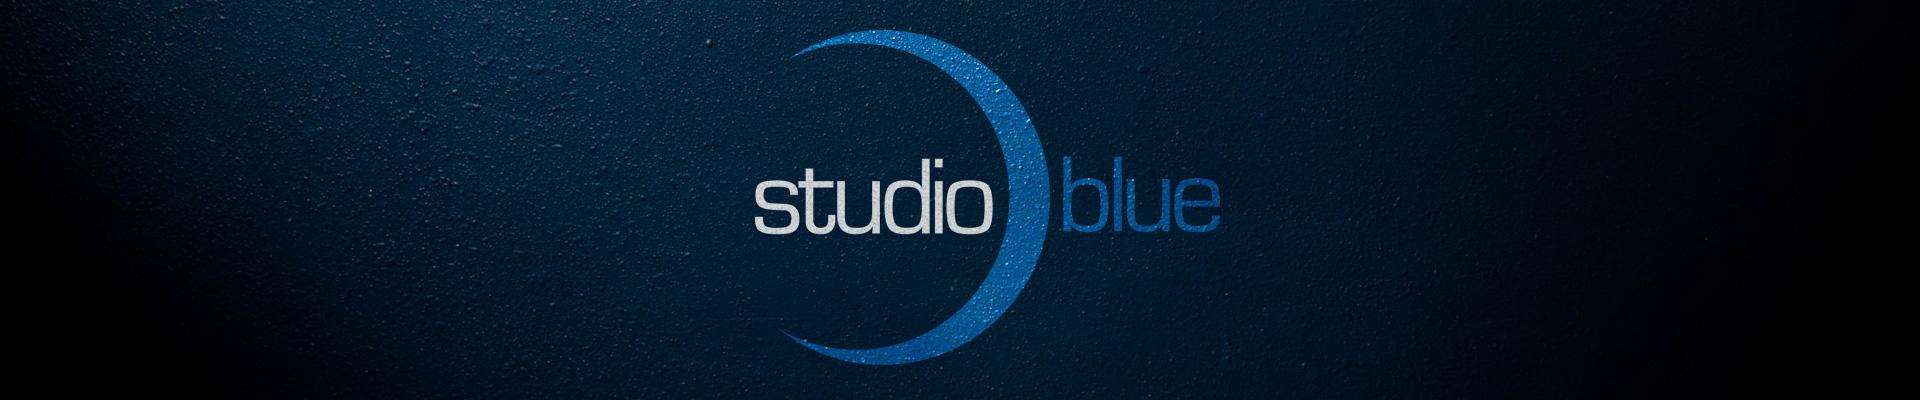 Welcome to Studio Blue Pilat